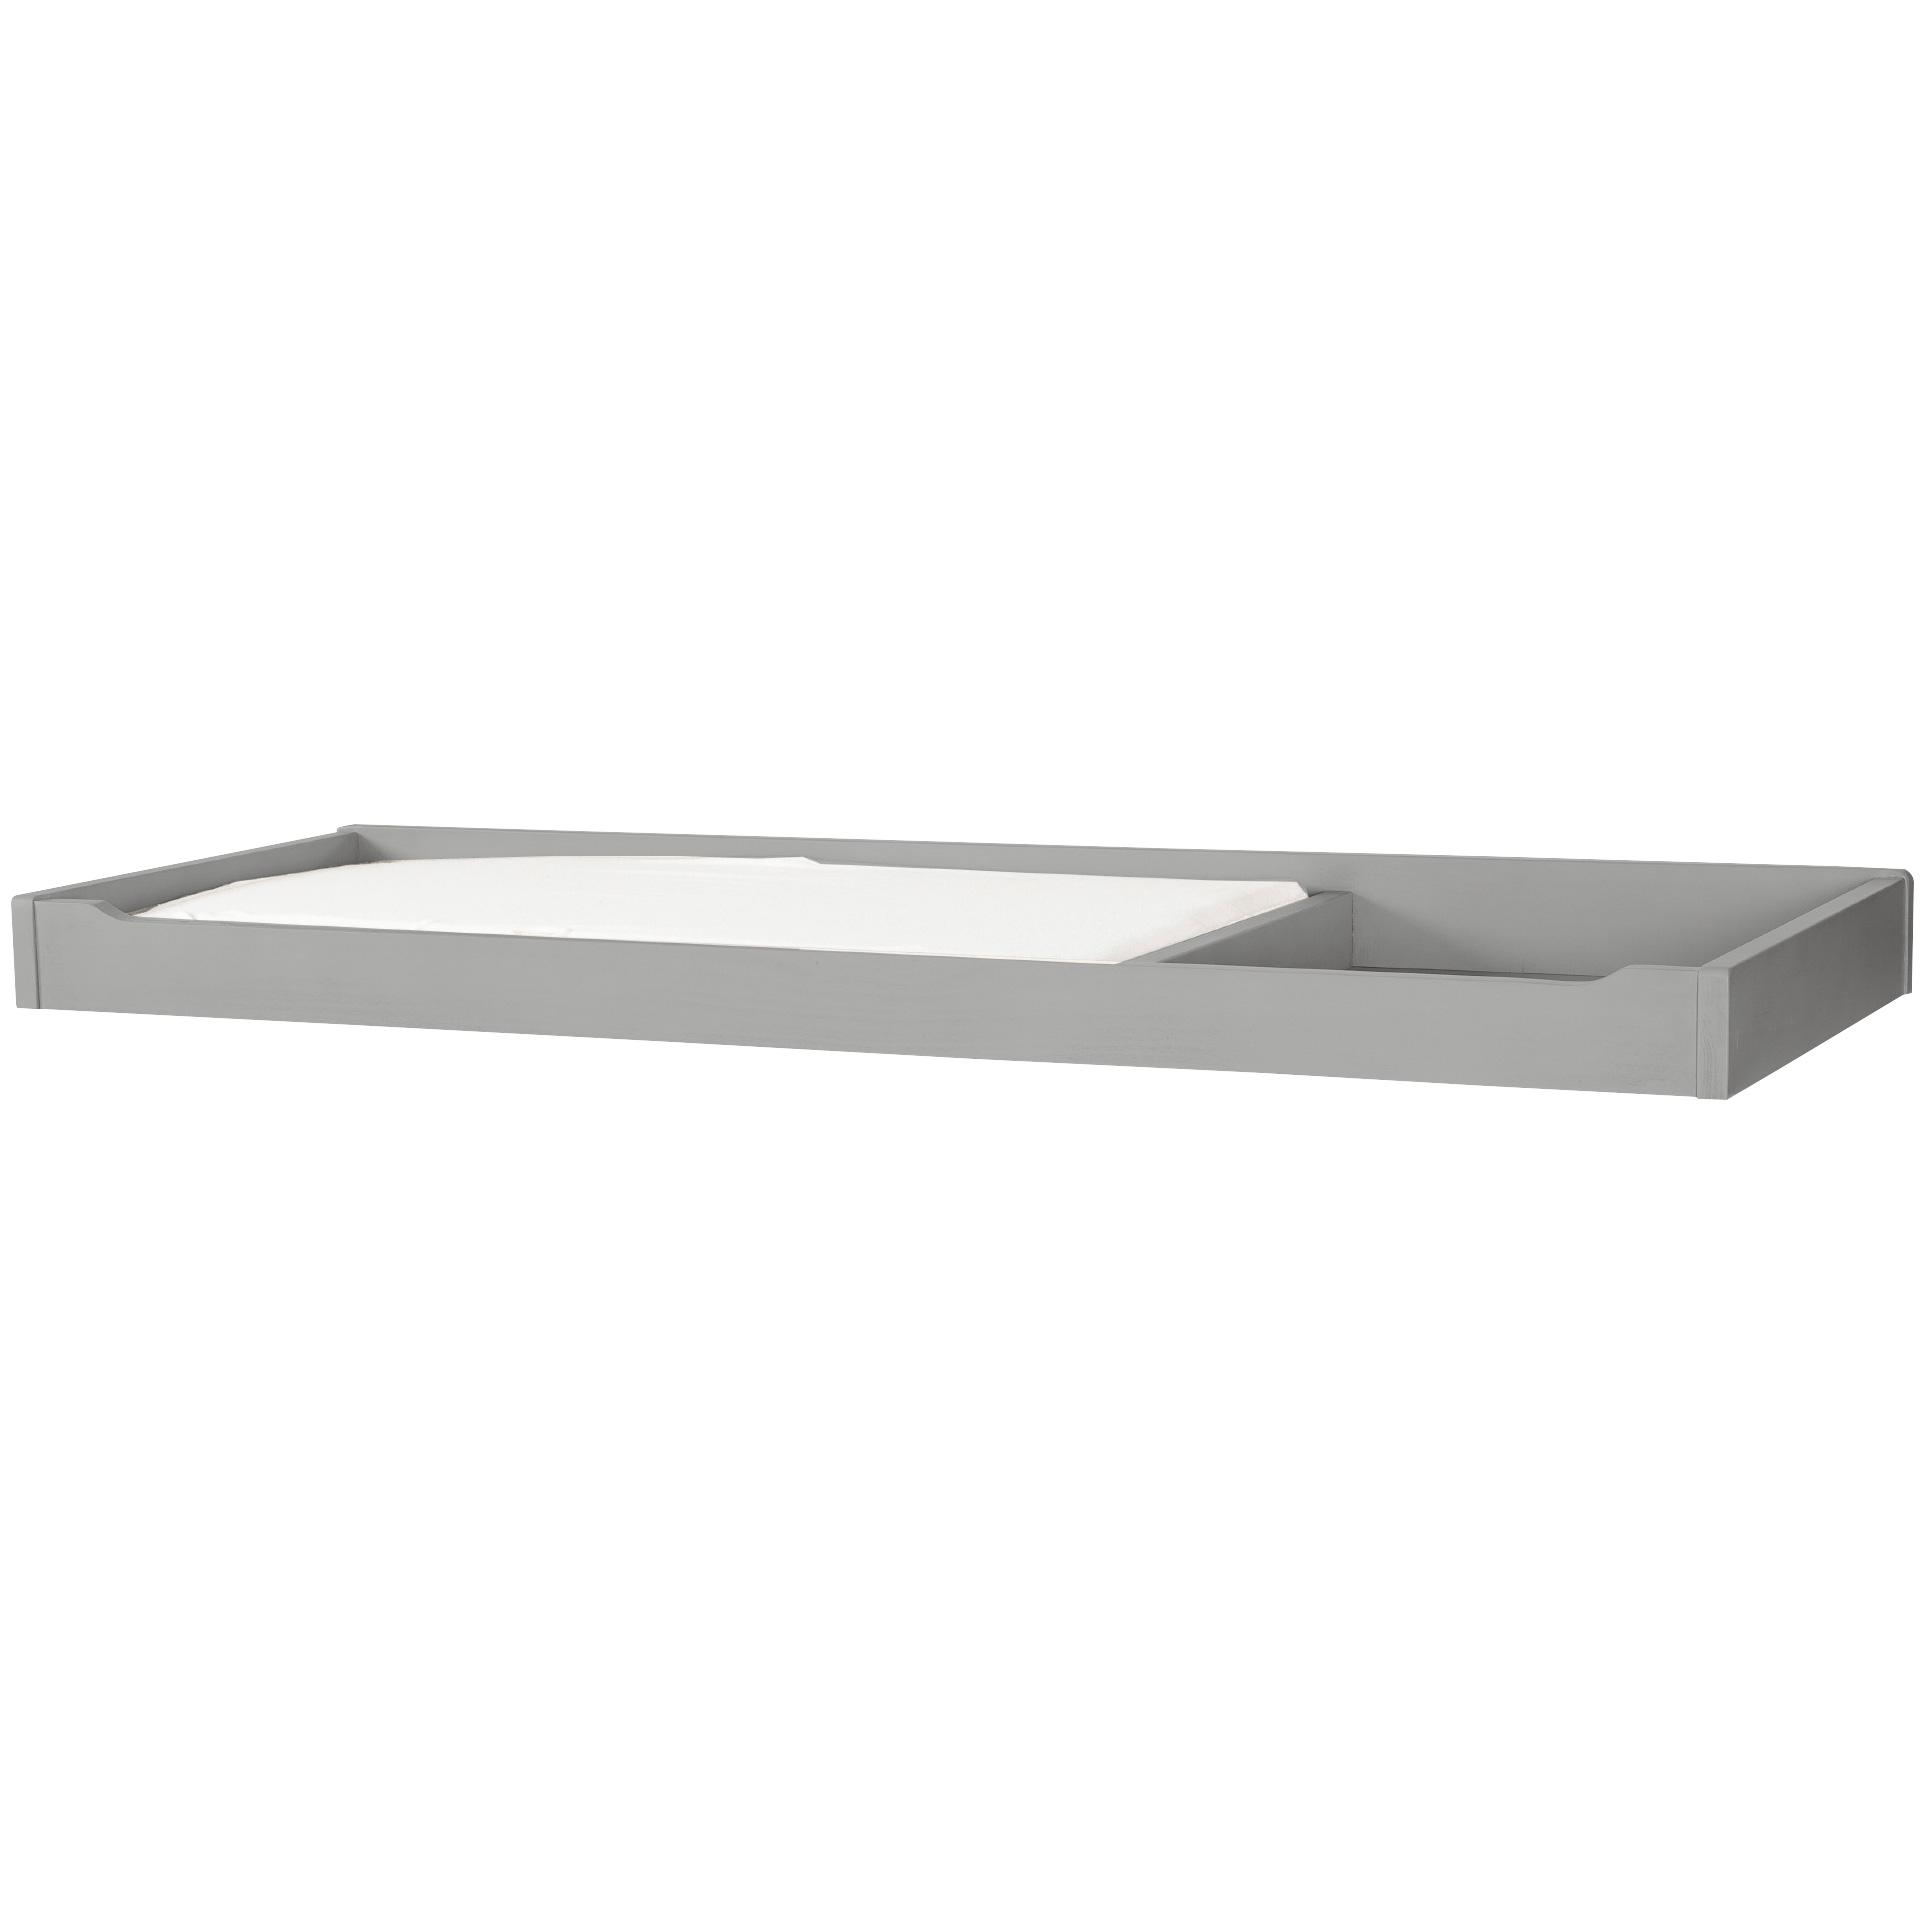 Westwood Design | Pine Ridge Cloud Changer Top